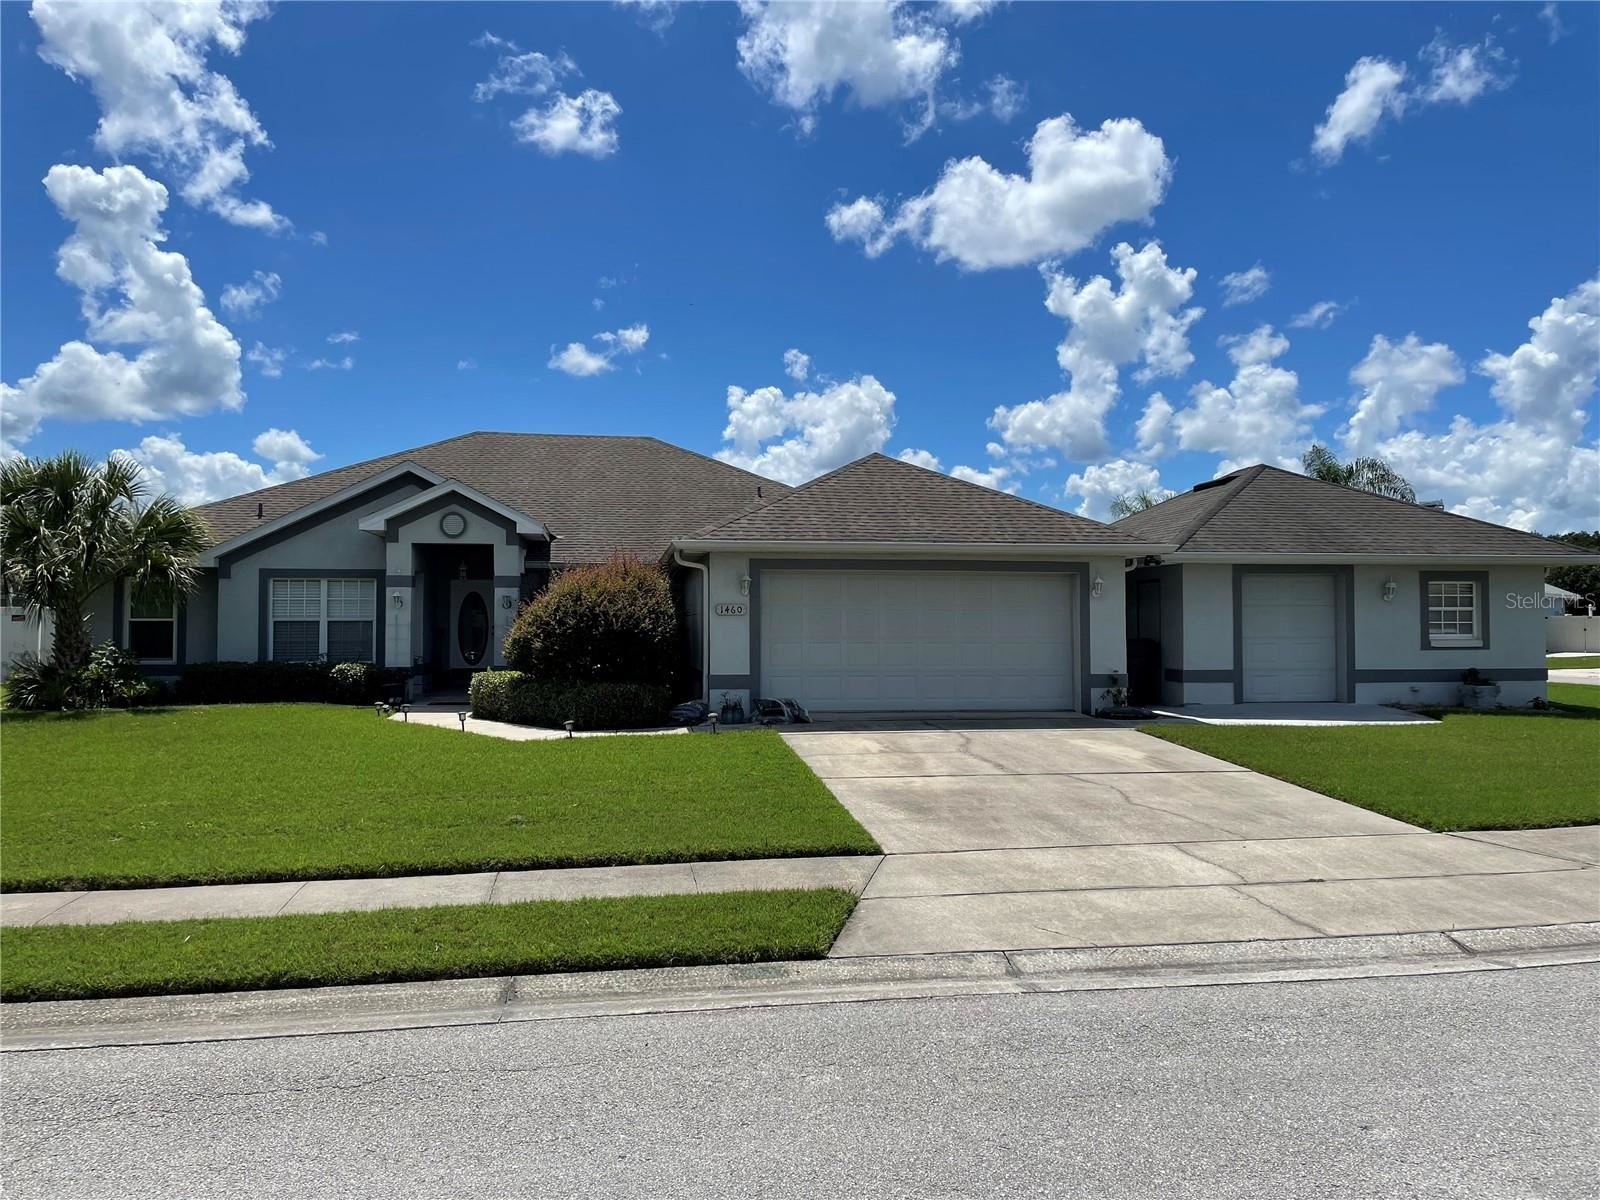 1460 BANBURY LOOP N, Lakeland, FL 33809 - #: P4917044